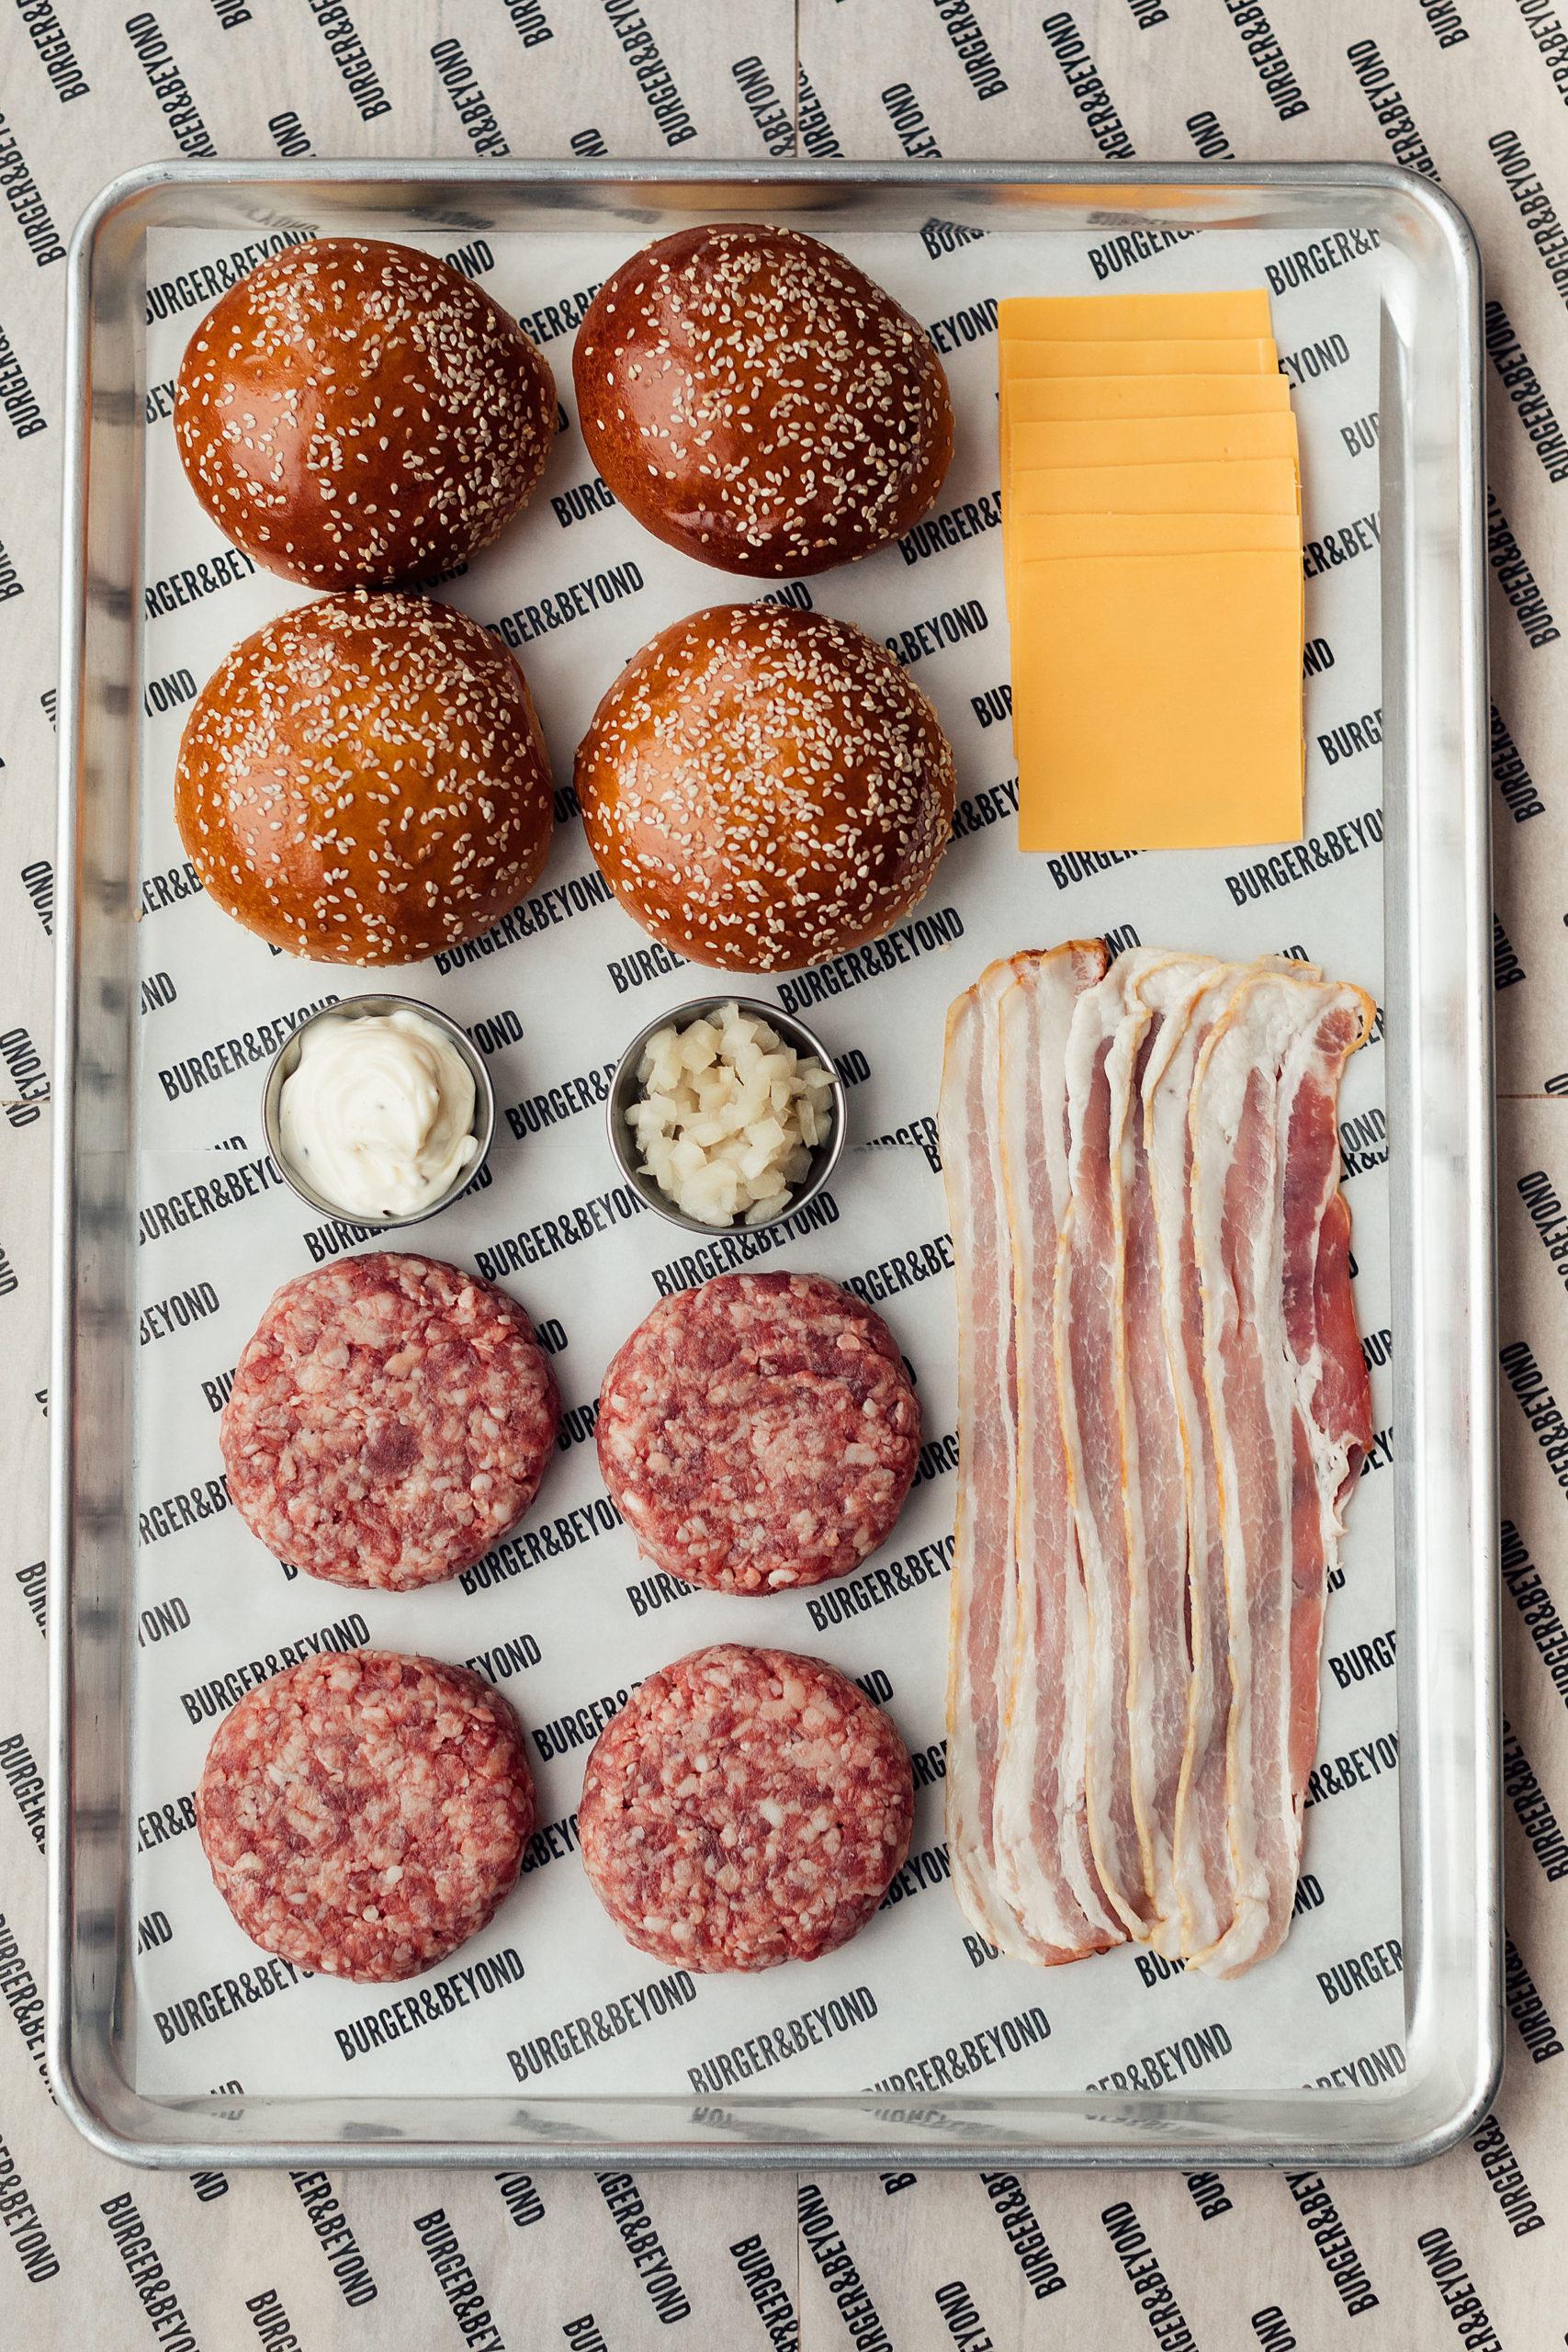 Bacon Butter Burger Kit Serves 4 Burger Beyond